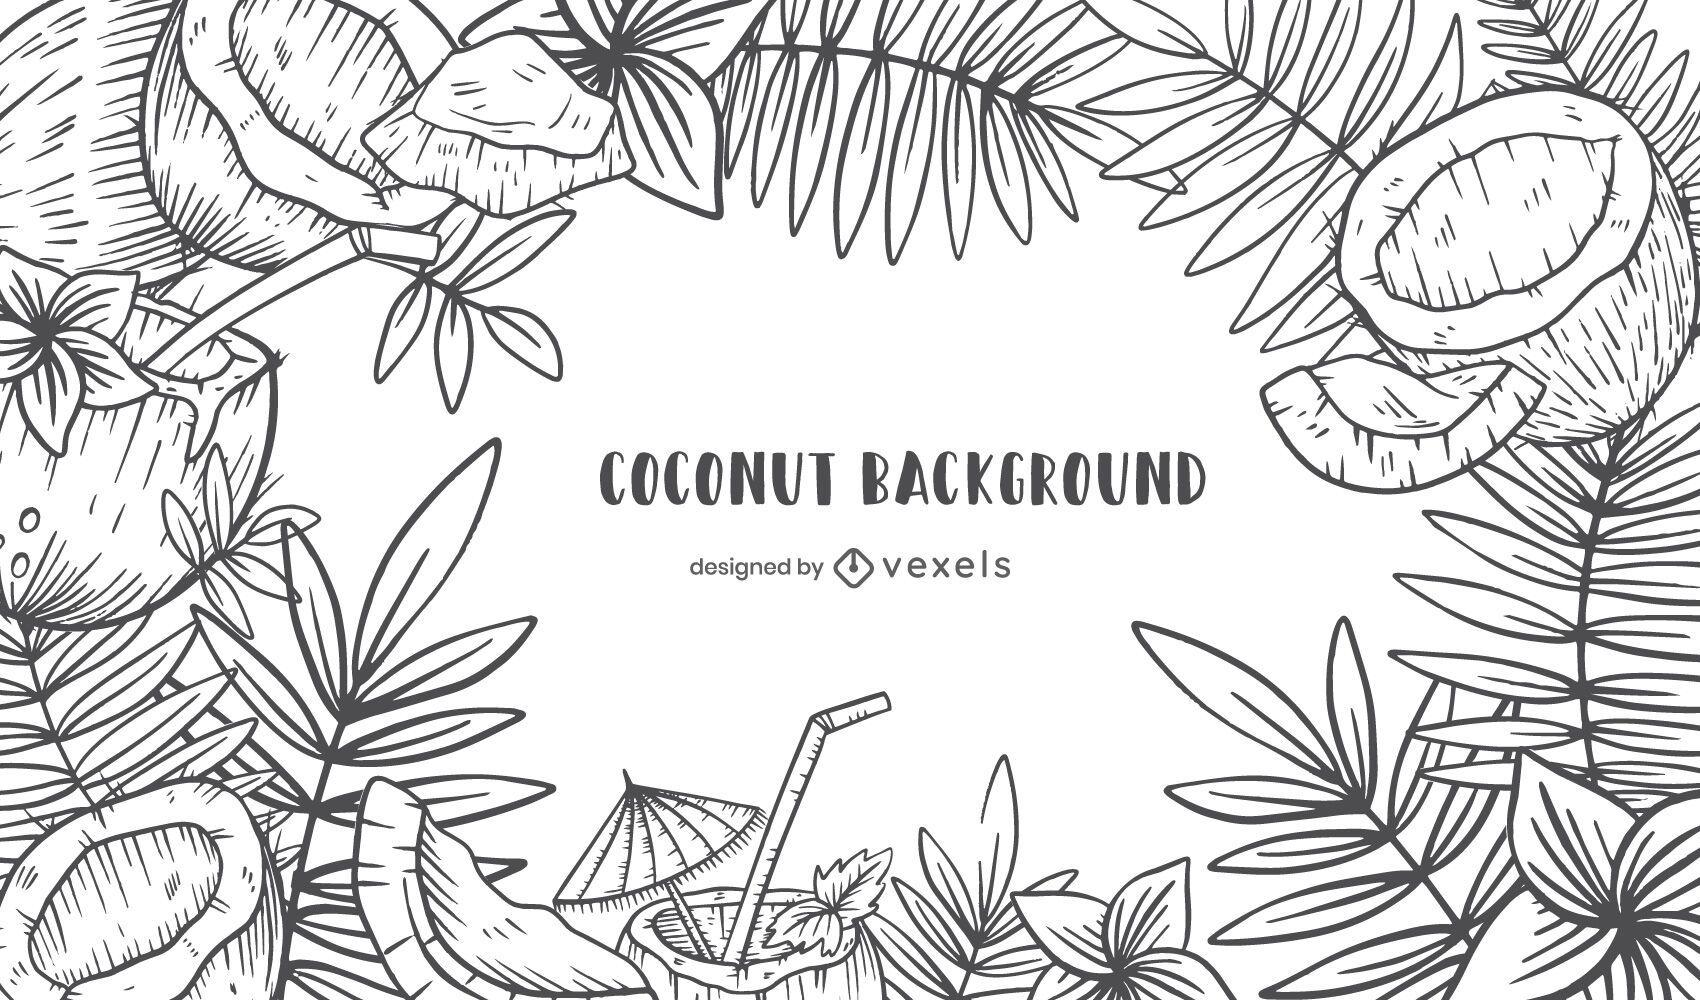 Hand drawn coconut bachground design